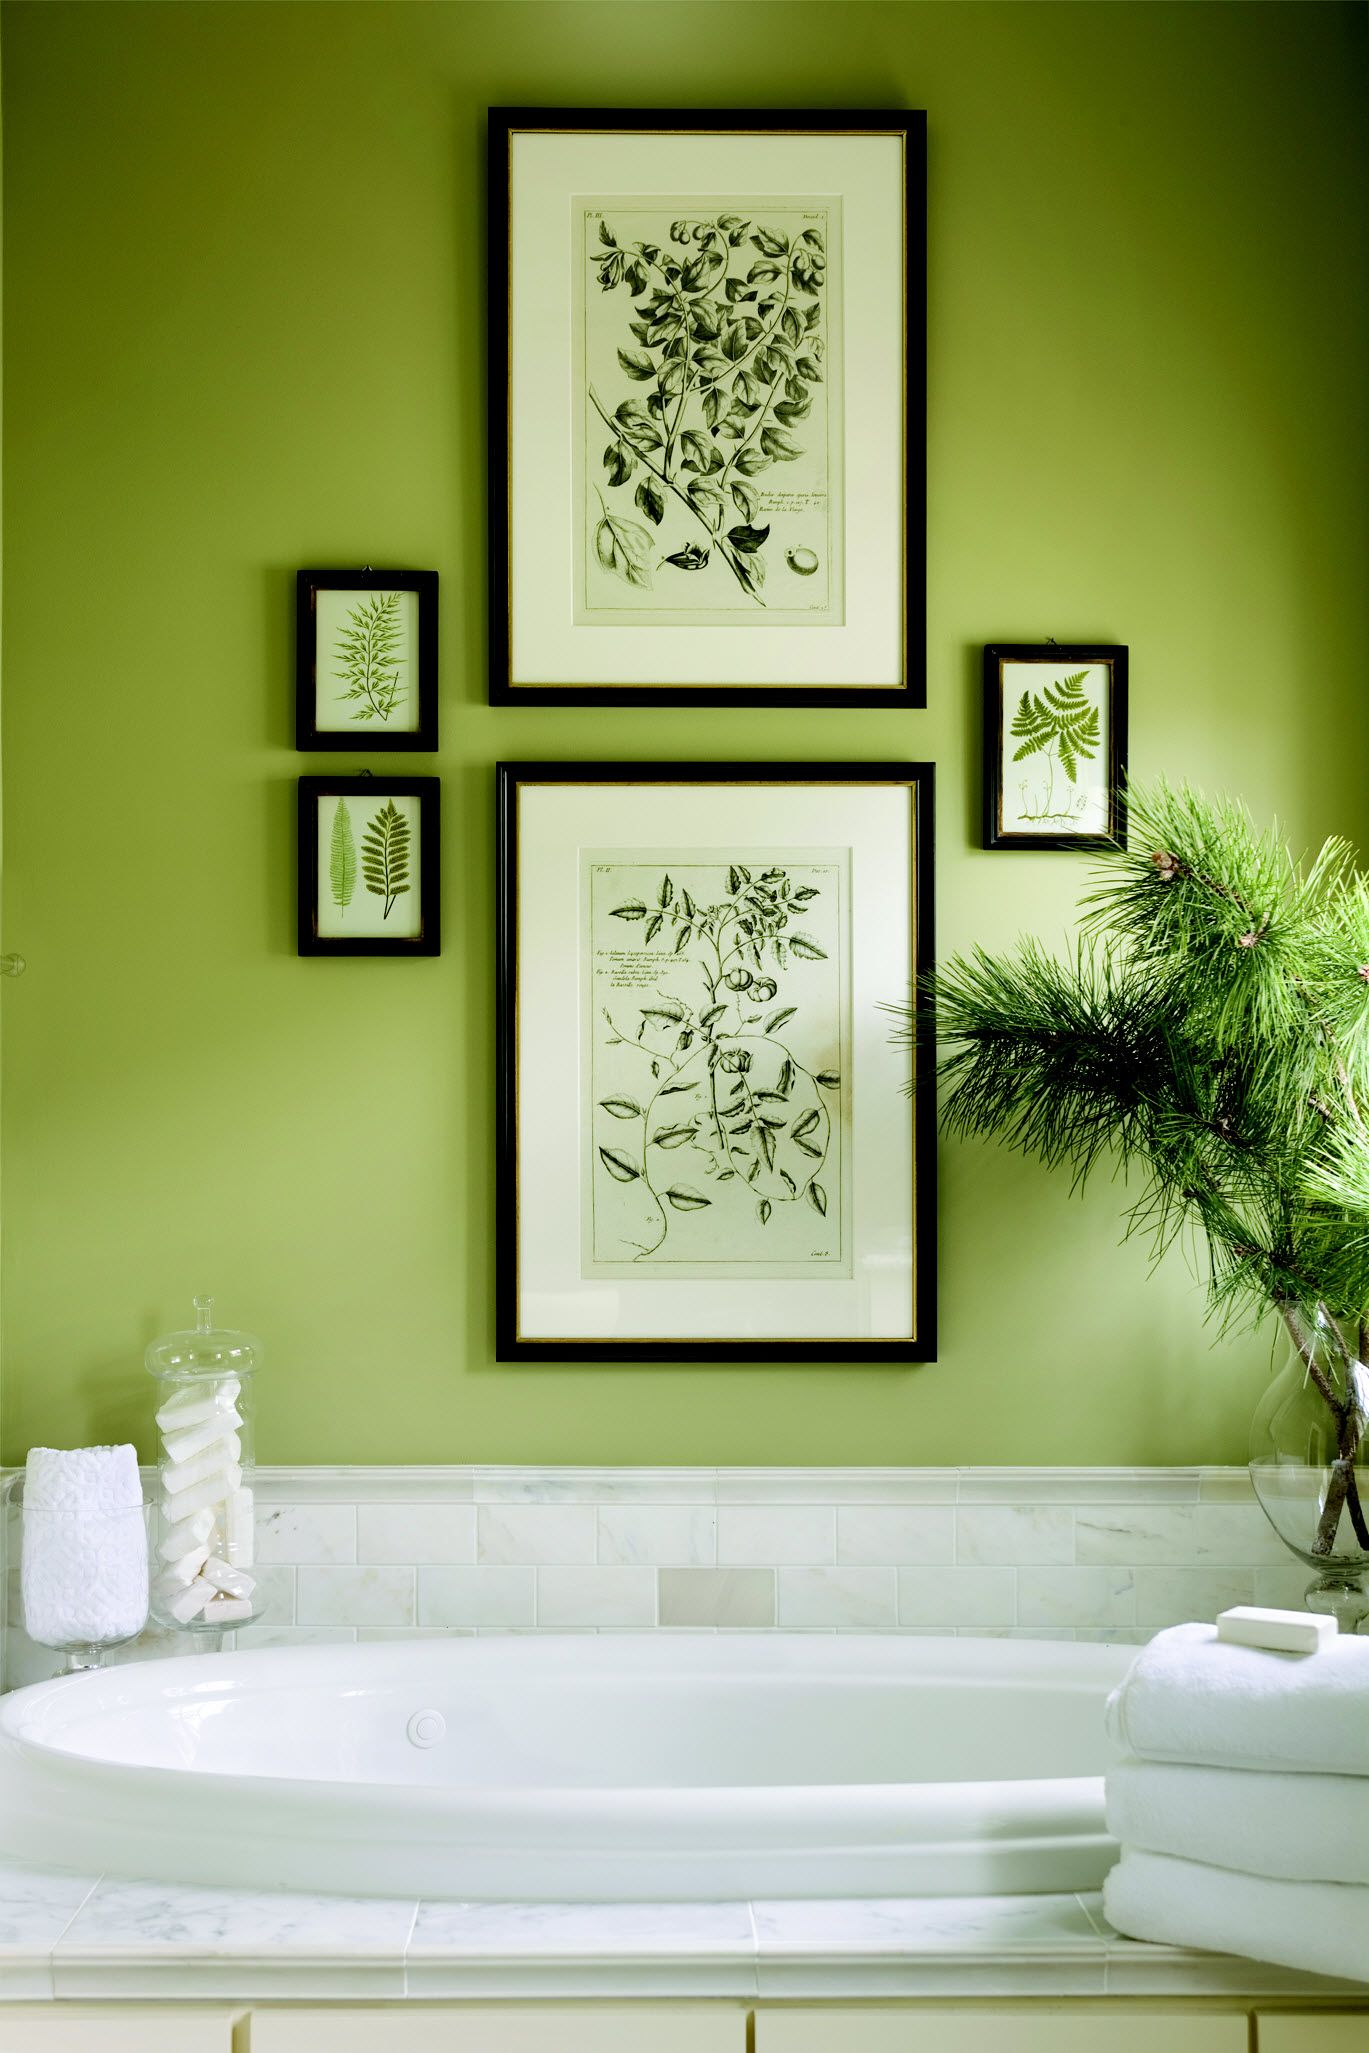 spoil holiday guests decorating pinterest bathroom colors rh pinterest com lime green bathroom decorating ideas Lime Green and Blue Bathroom Decor